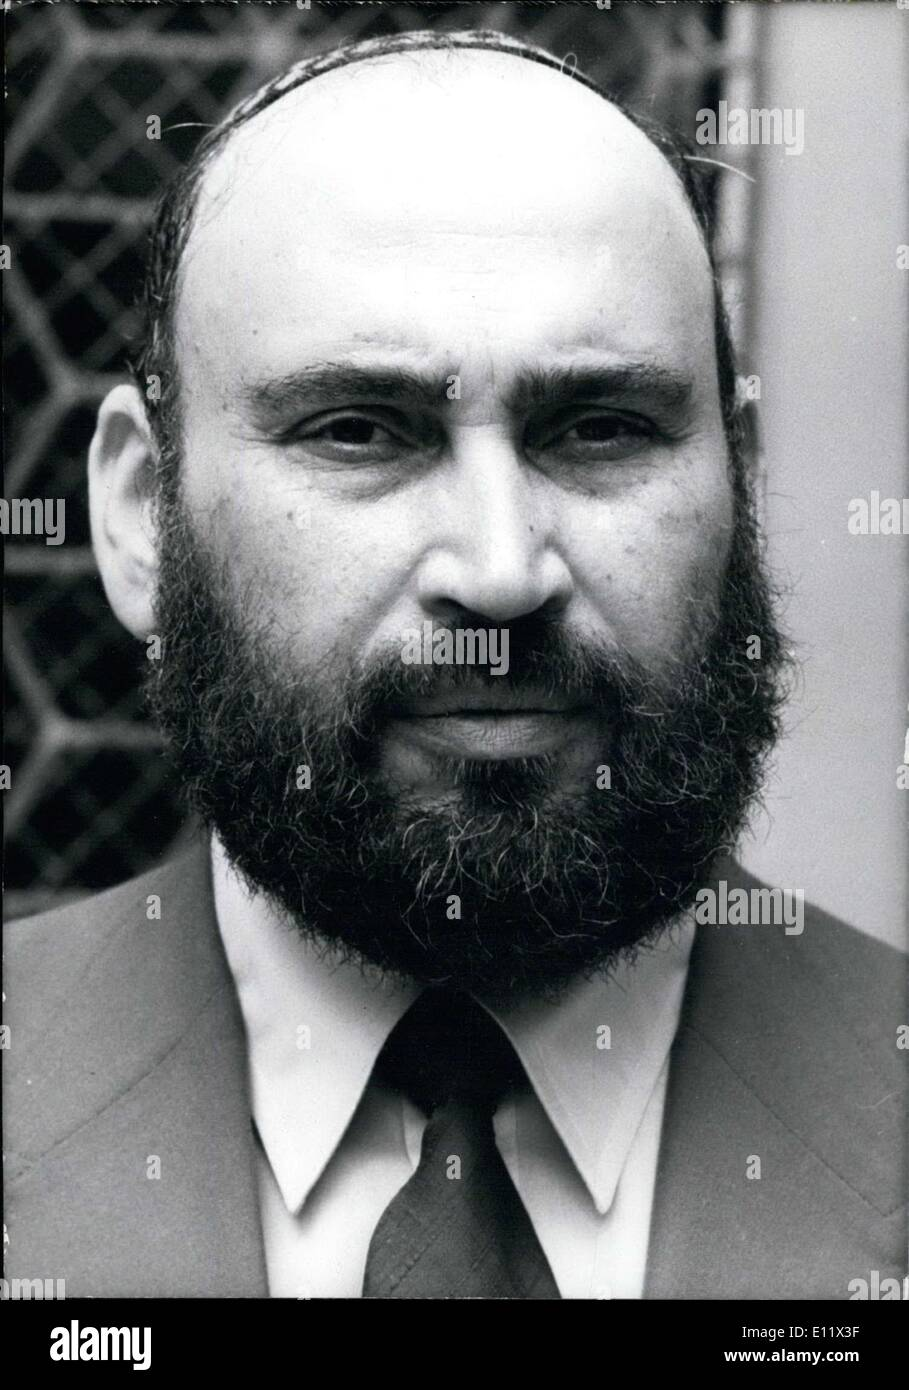 Jun. 13, 1980 - He will succeed Jacob Kaplan. He was born in Algeria in 1930. He was the director of the Hebrew - Stock Image